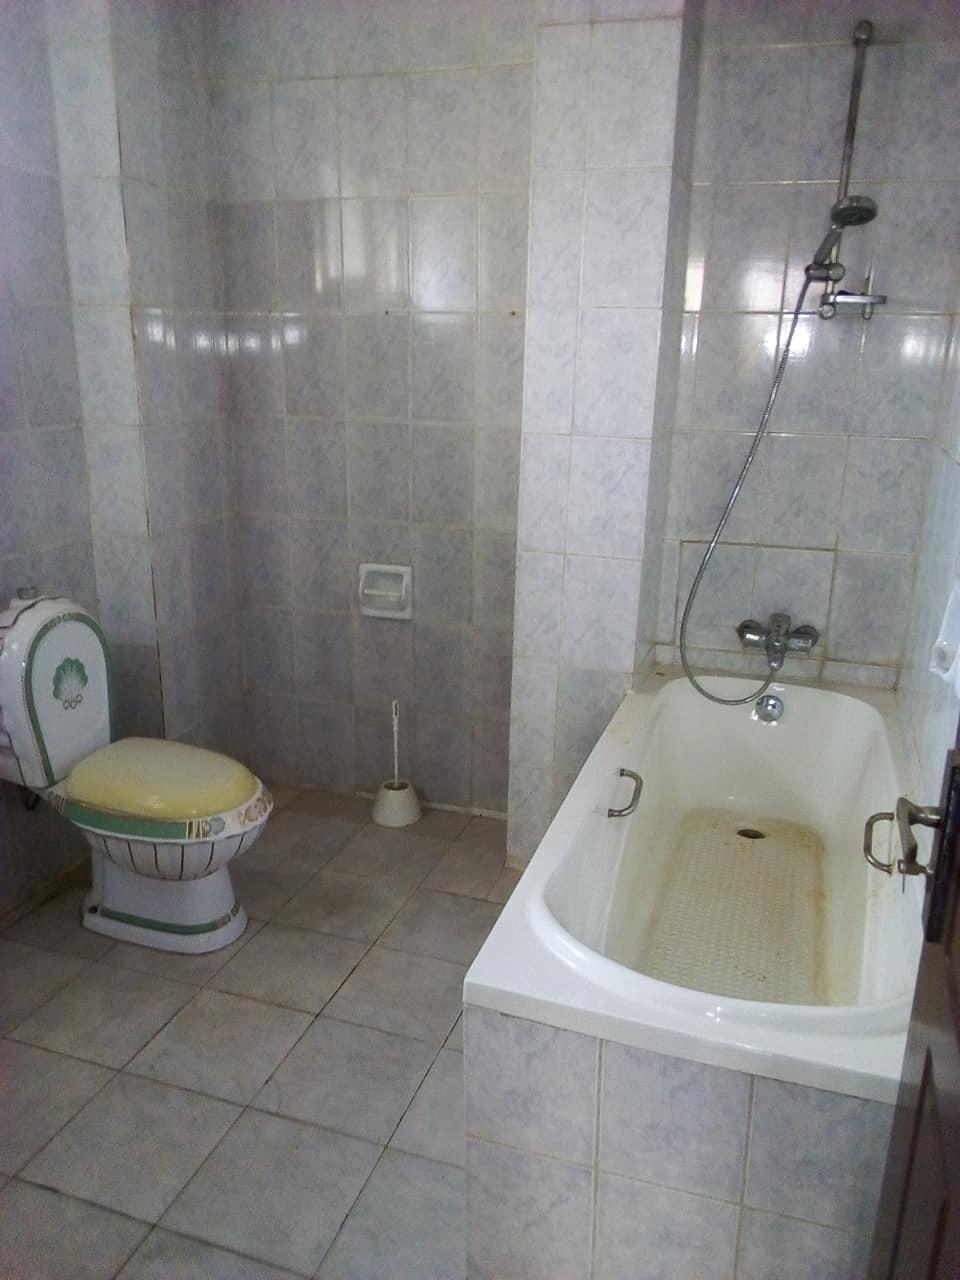 Office to rent at Yaoundé, Tsinga, apres super marche max - 100 m2 - 300 000 FCFA